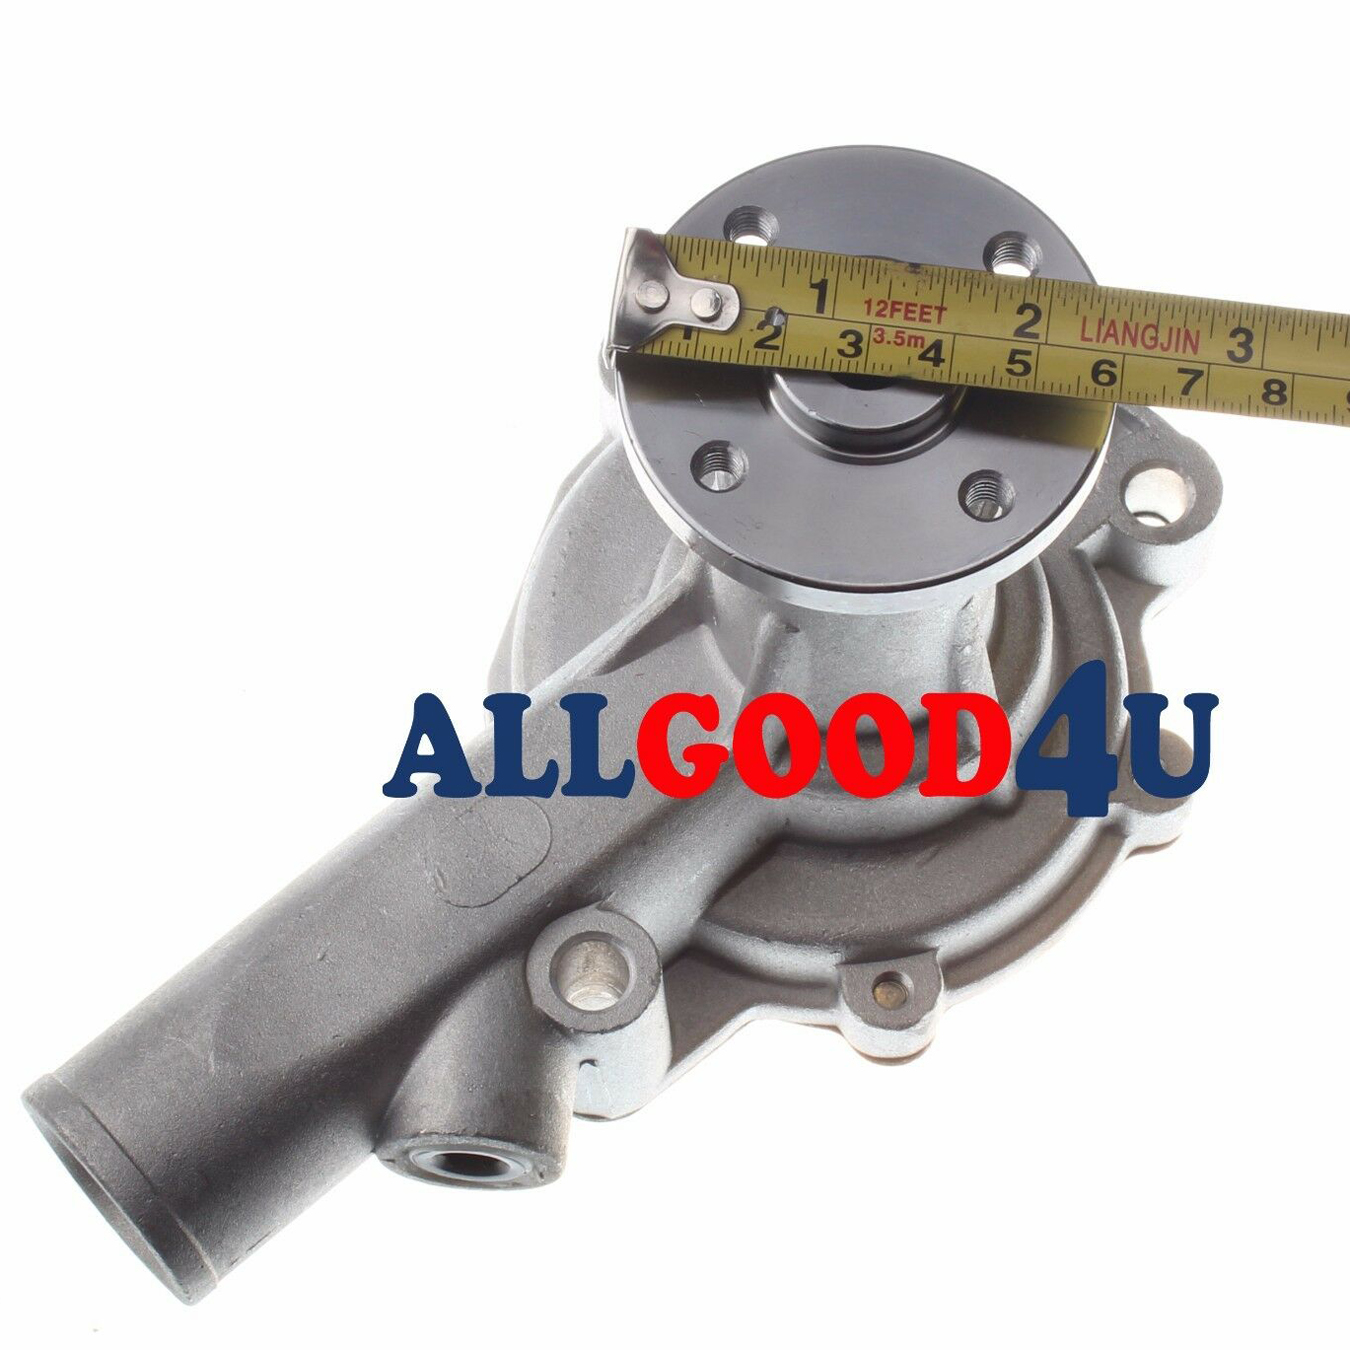 Details about Water Pump Fits Bolens Iseki TX1500 G172 Tractor Mitsubishi  KE75 Diesel Engine